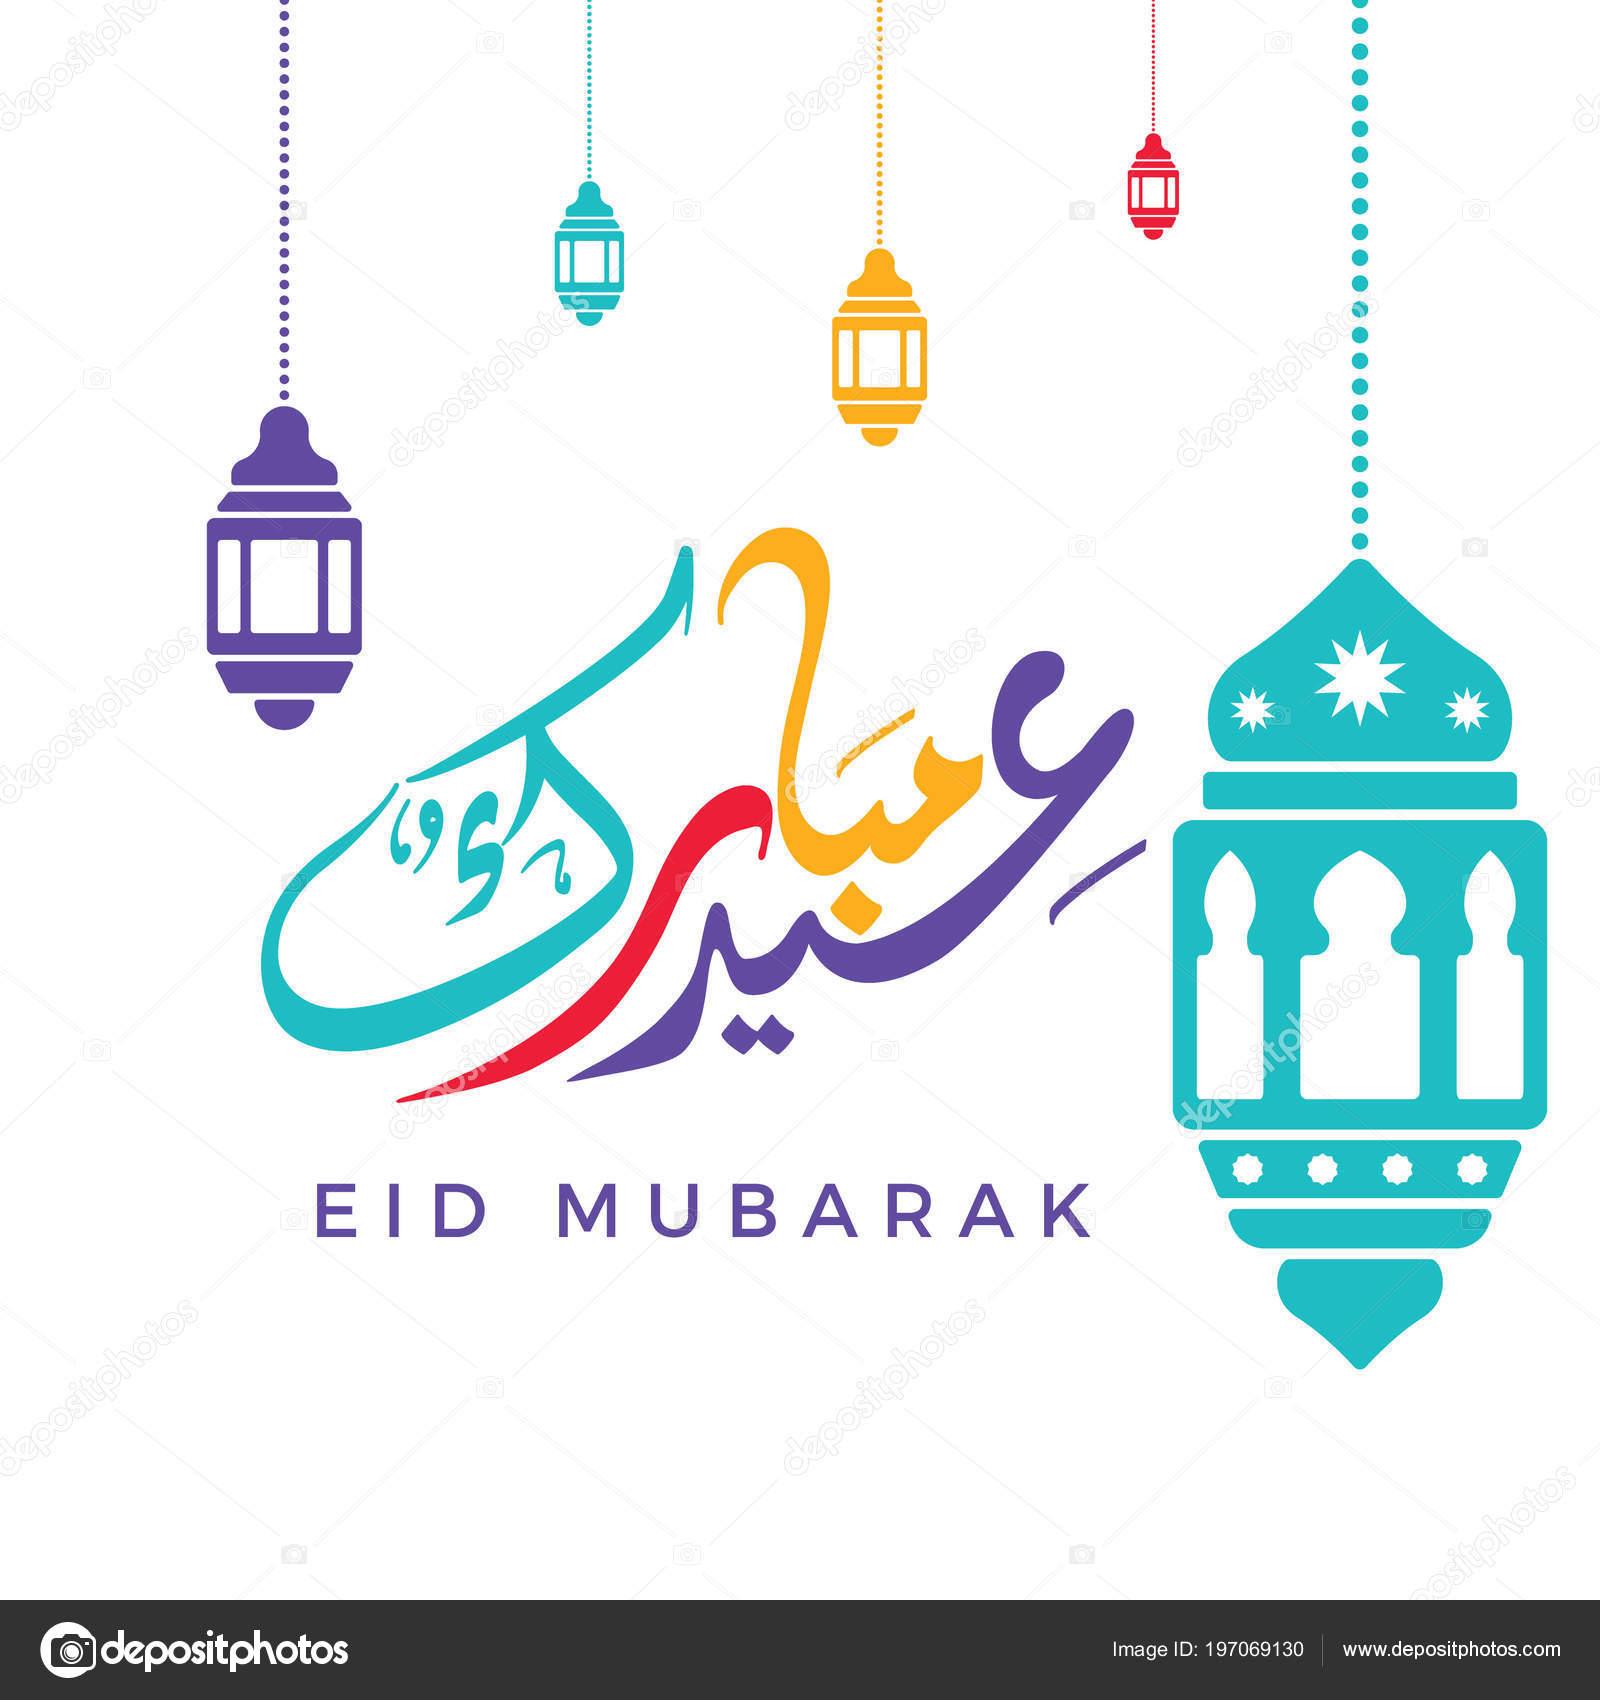 Eid Mubarak Vector Illustration Greeting Card Design Vector Image By C Ahsanalvi Vector Stock 197069130